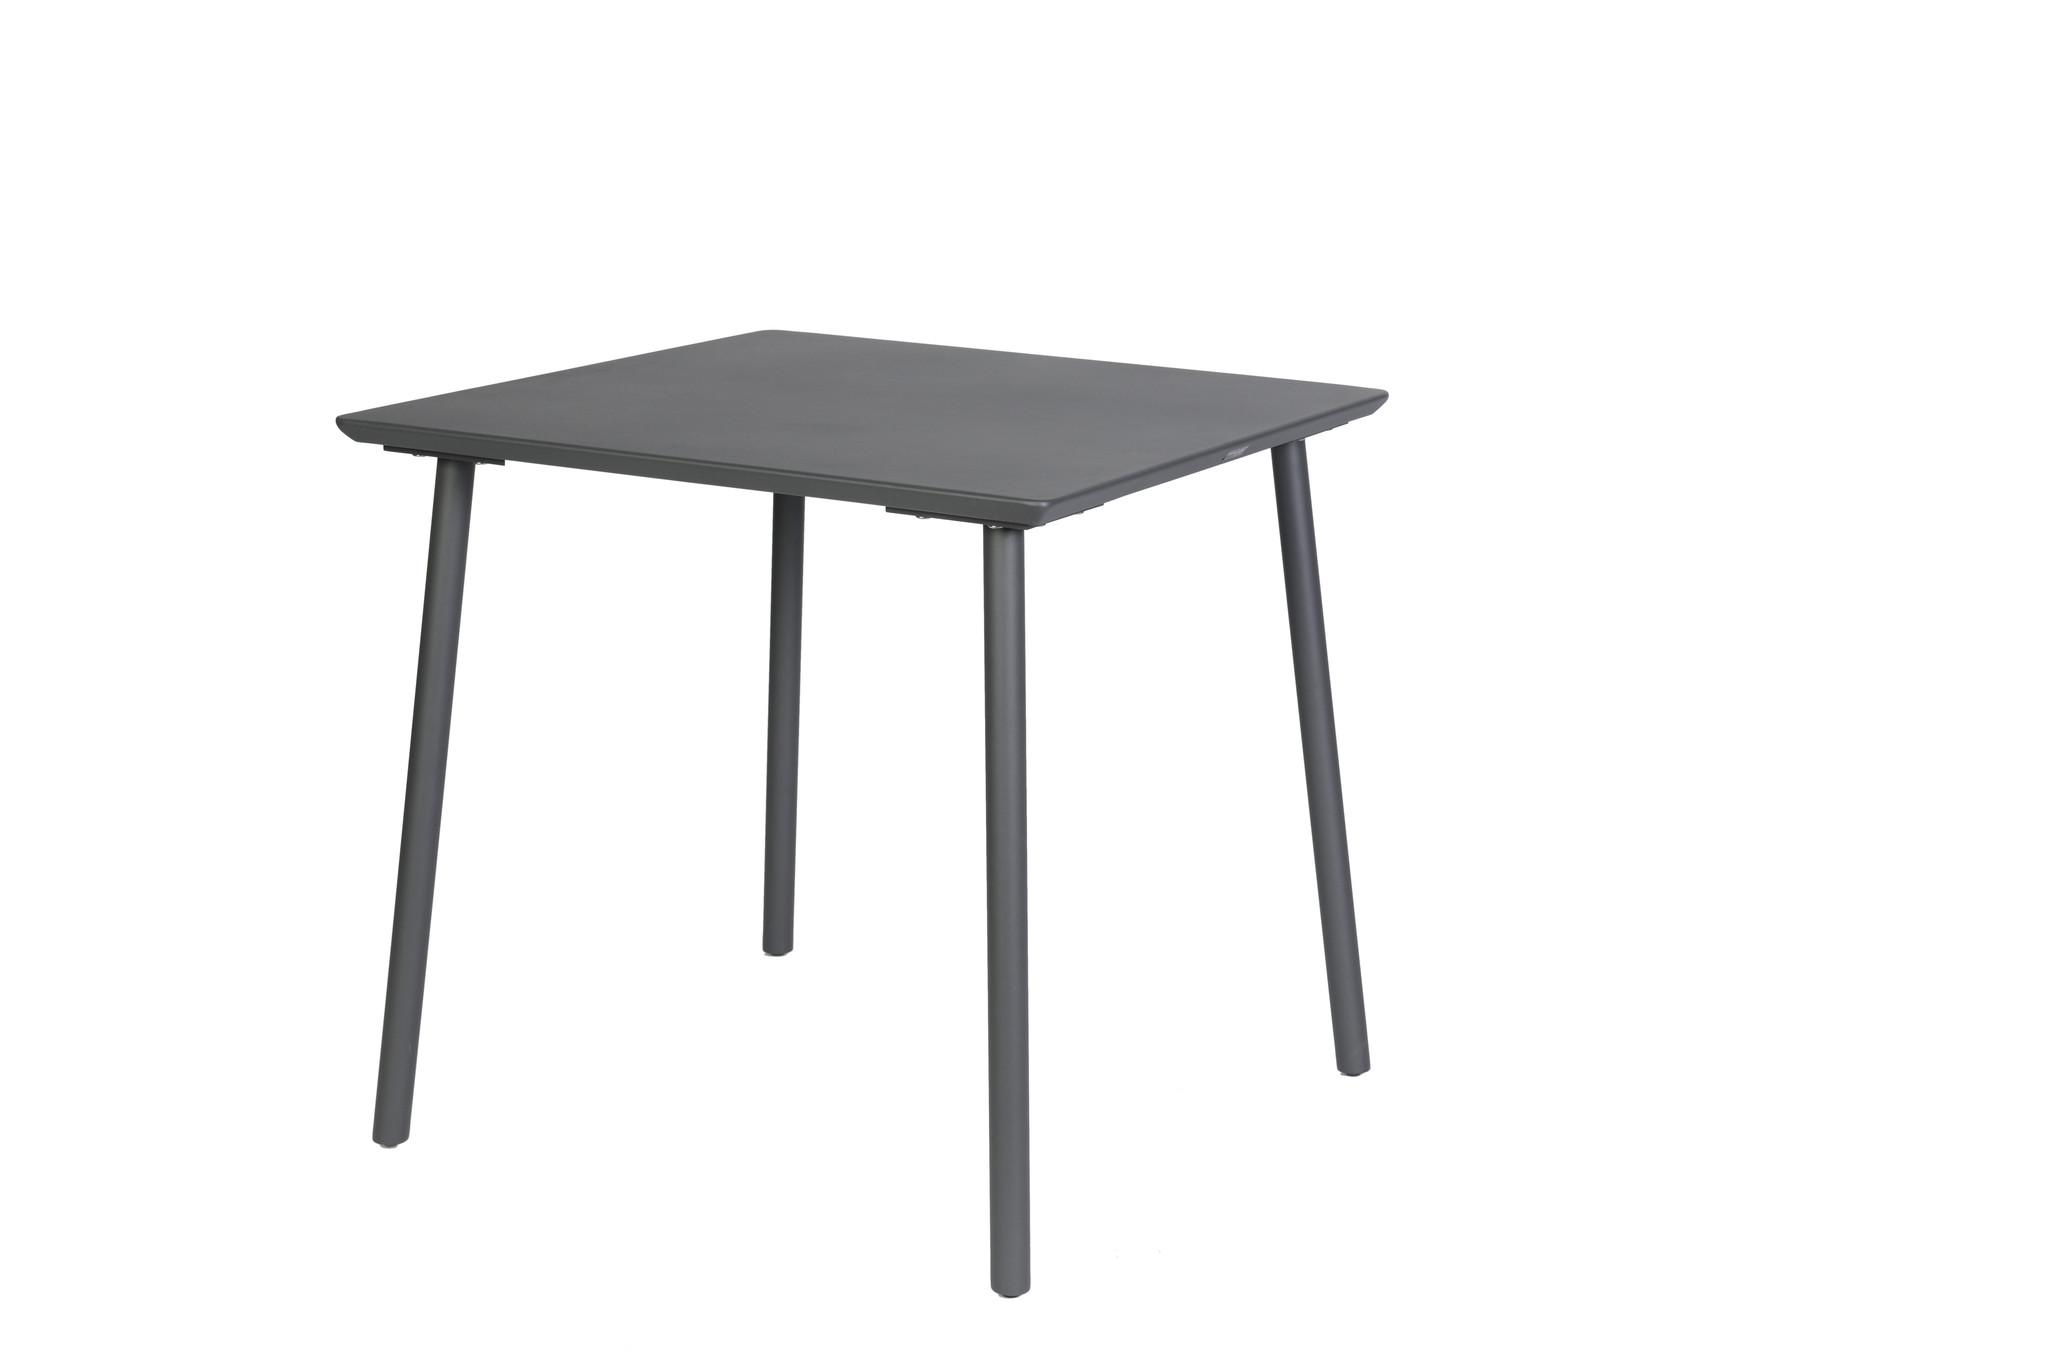 Max & Luuk George tafel - vierkante tafel